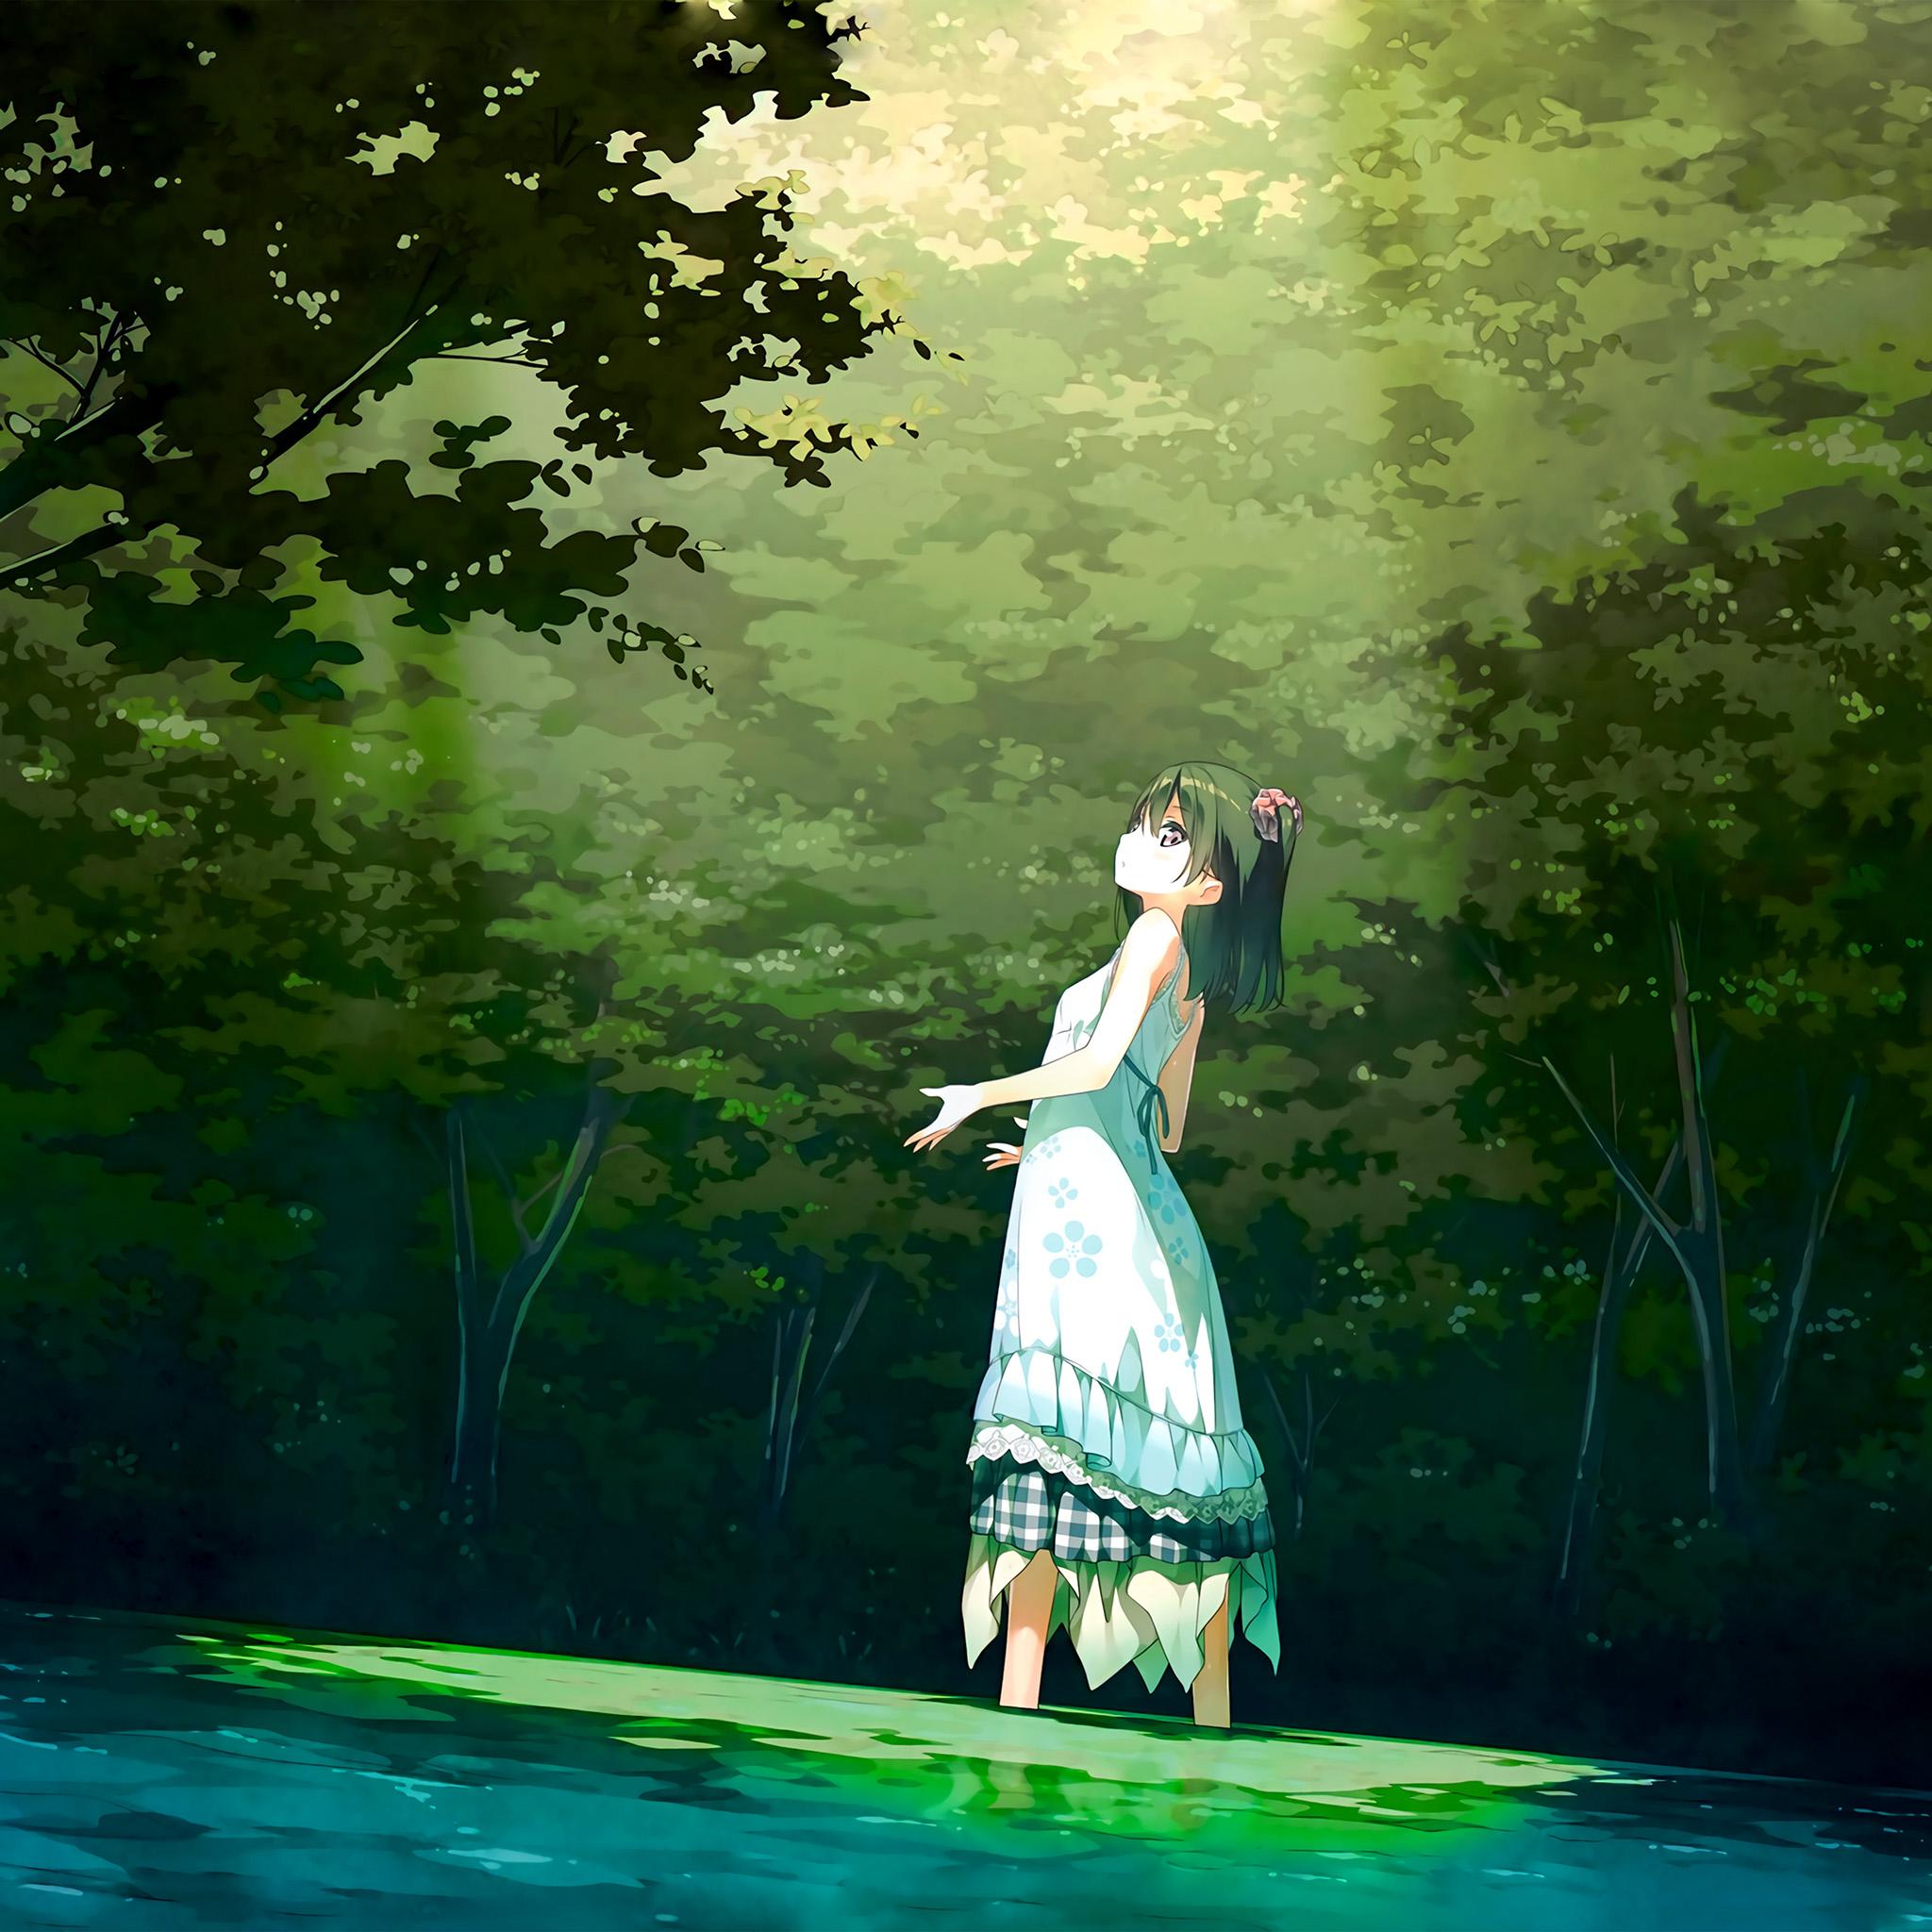 Iphone 4 Car Wallpapers Be21 Anime Girl Green Art Illustration Wallpaper